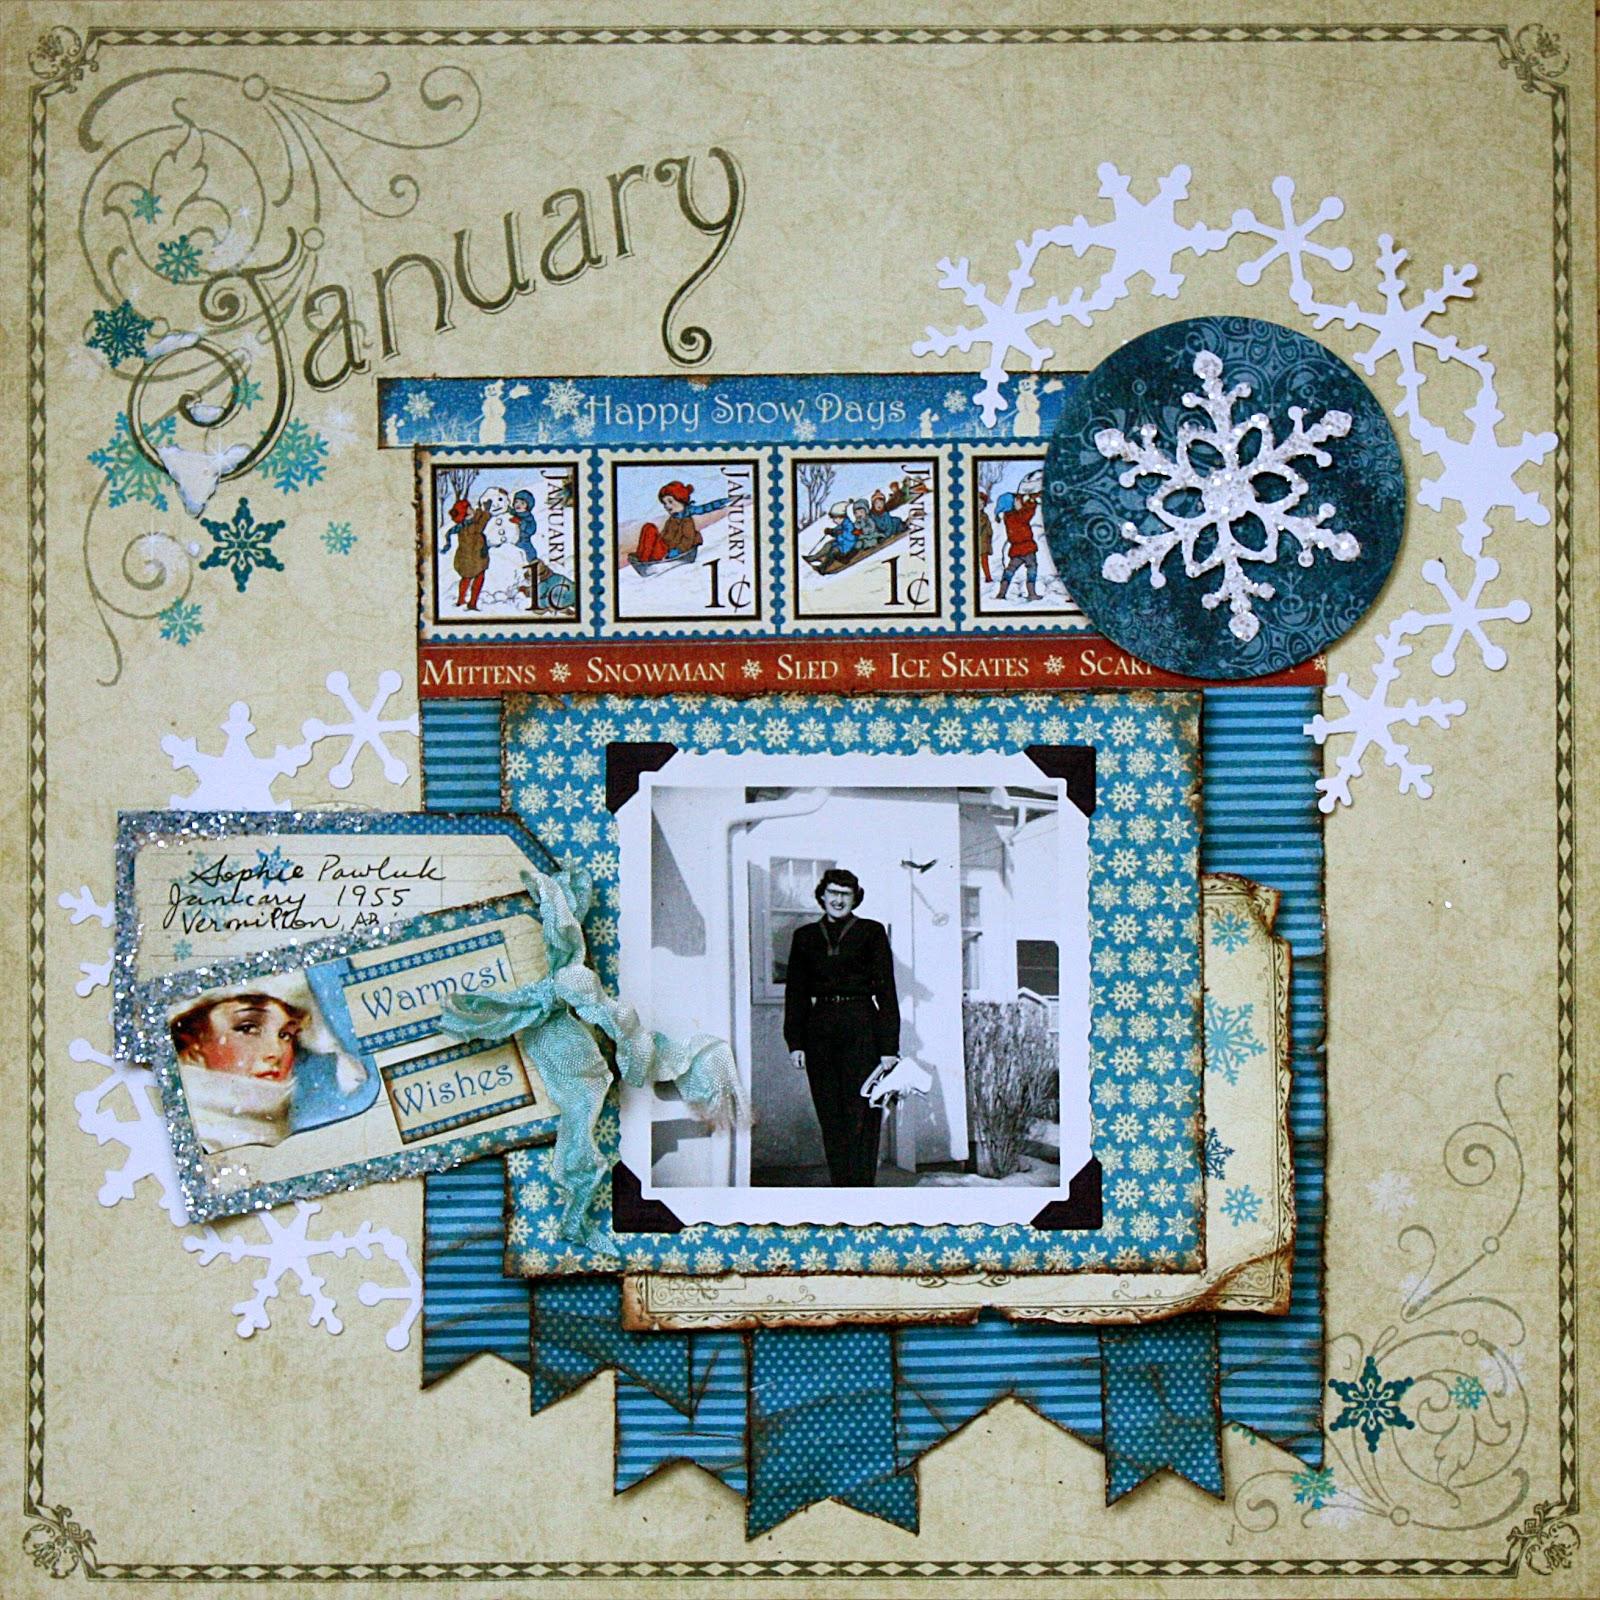 January scrapbook ideas - January